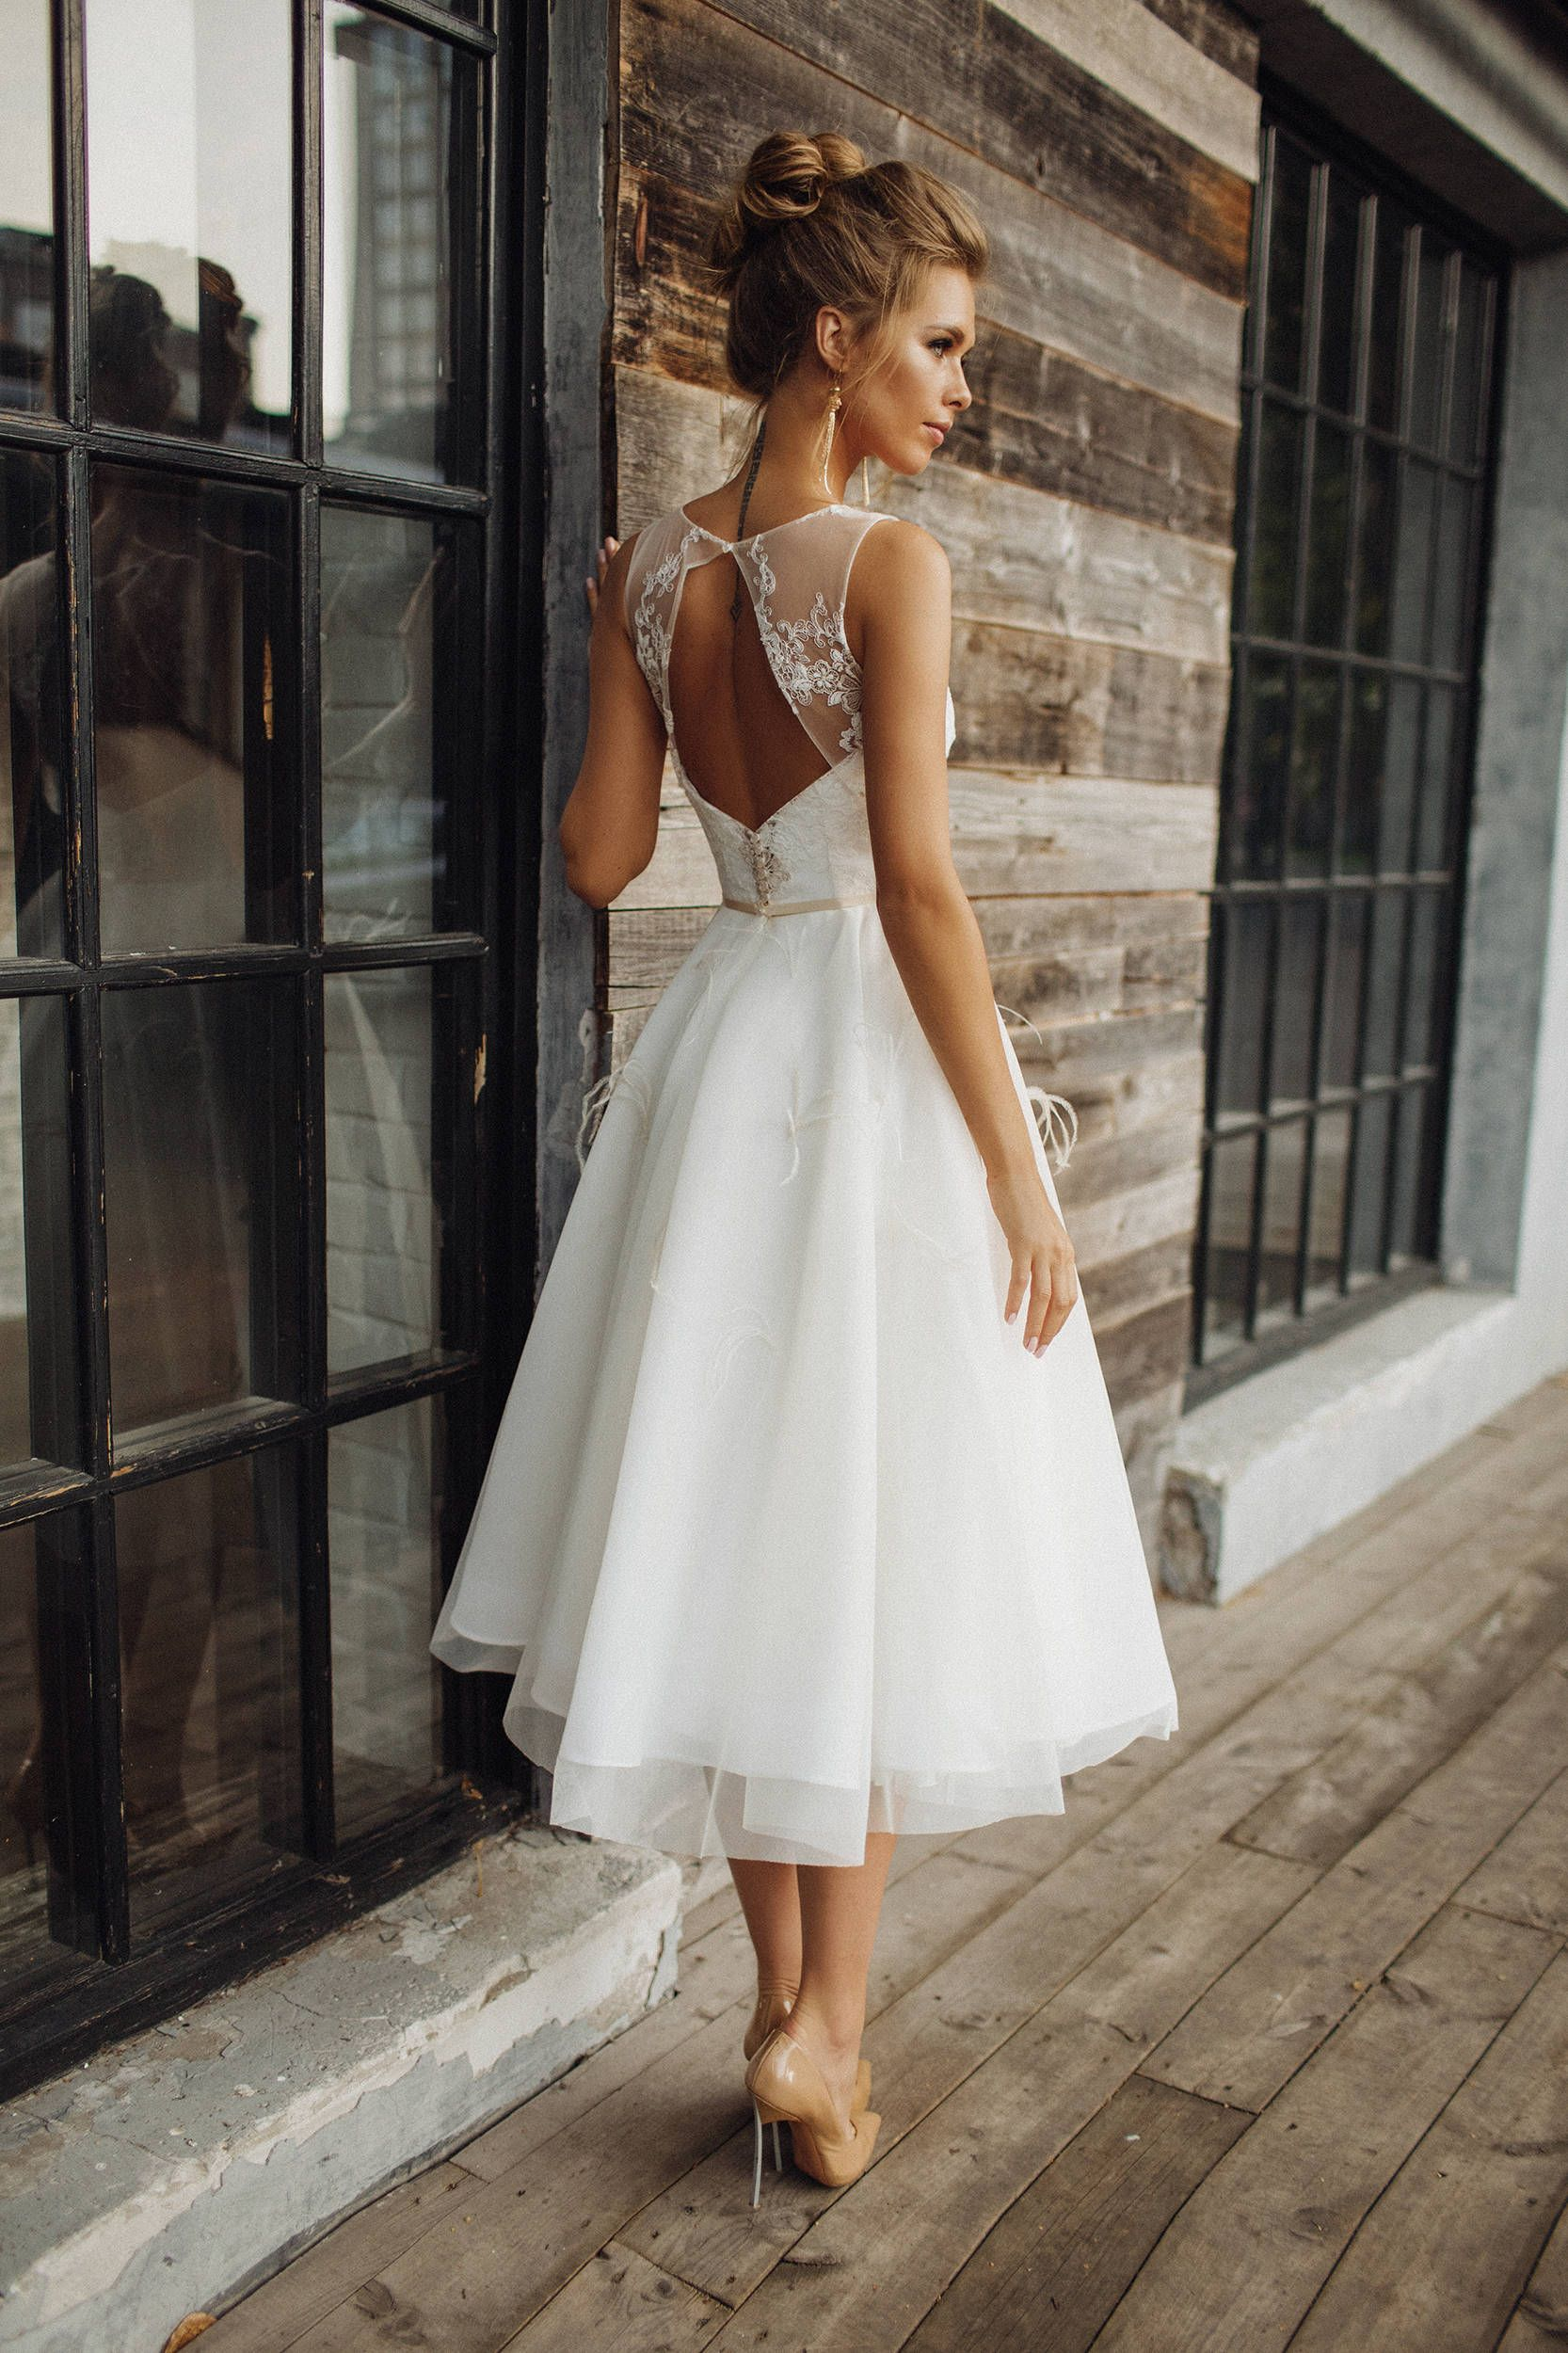 Stefani Short Wedding Dress By Alex Veil Bridal Affiliatelink Wedding Short Bridal Gown Tea Length Wedding Dress Tea Length Wedding Dresses Lace [ 2500 x 1666 Pixel ]